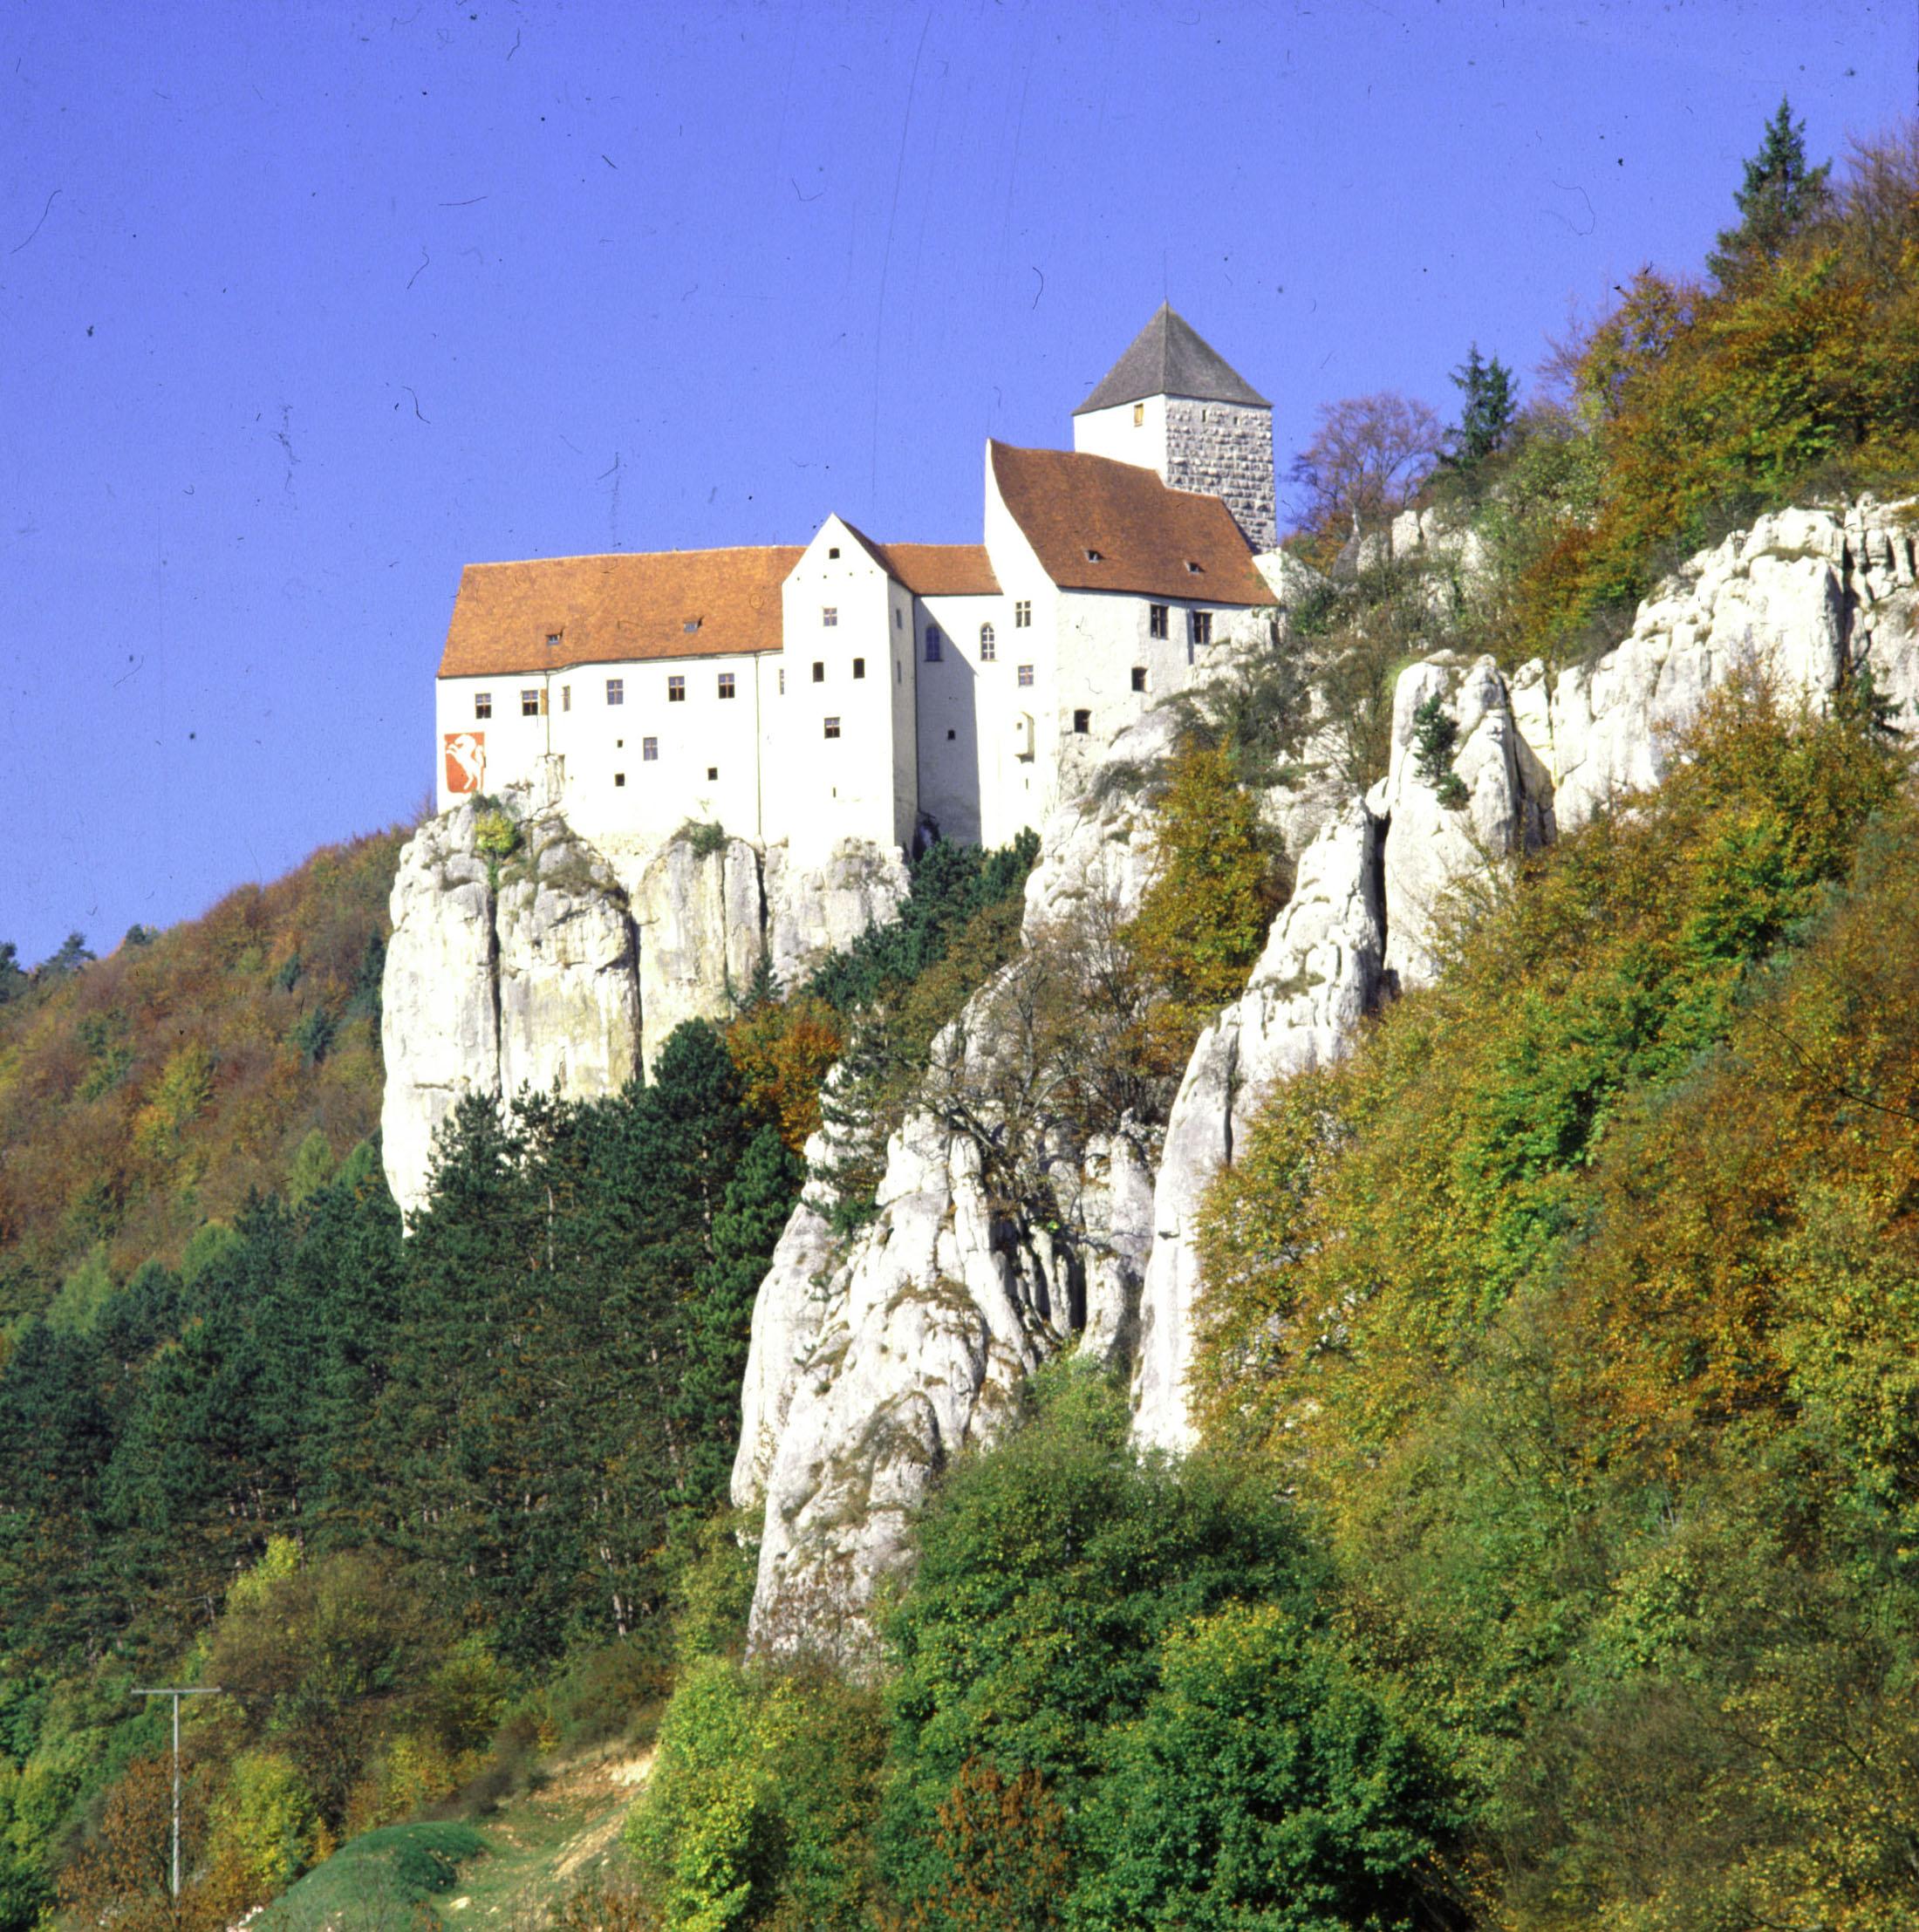 Prunn Castle over the valley of the river Altmühl - Die Burg Prunn thront über dem Altmühltal